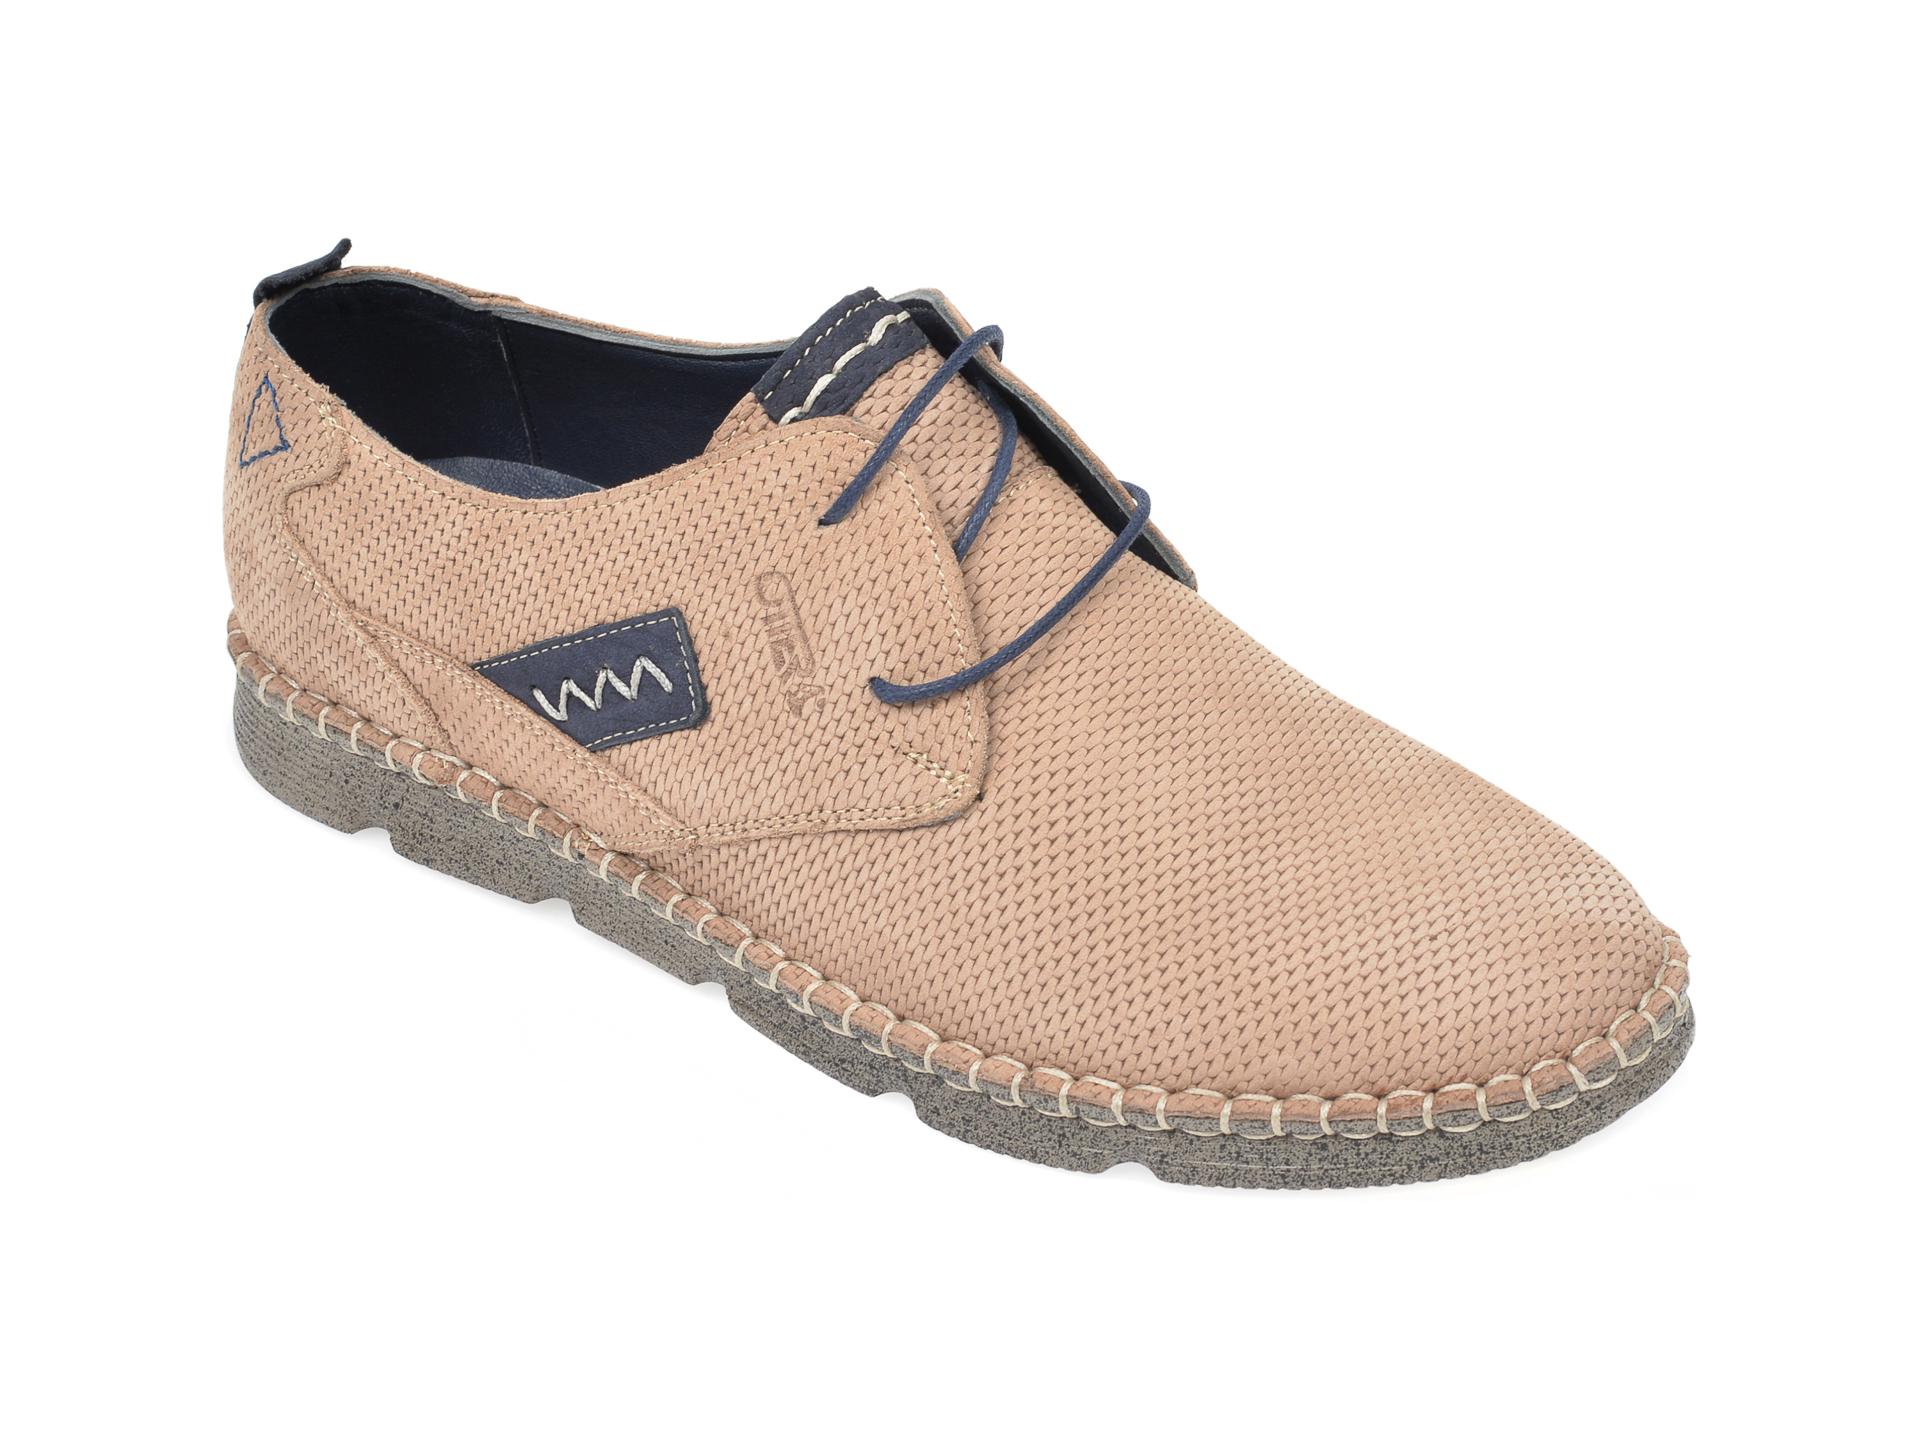 Pantofi Otter Maro, 2818, Din Nabuc